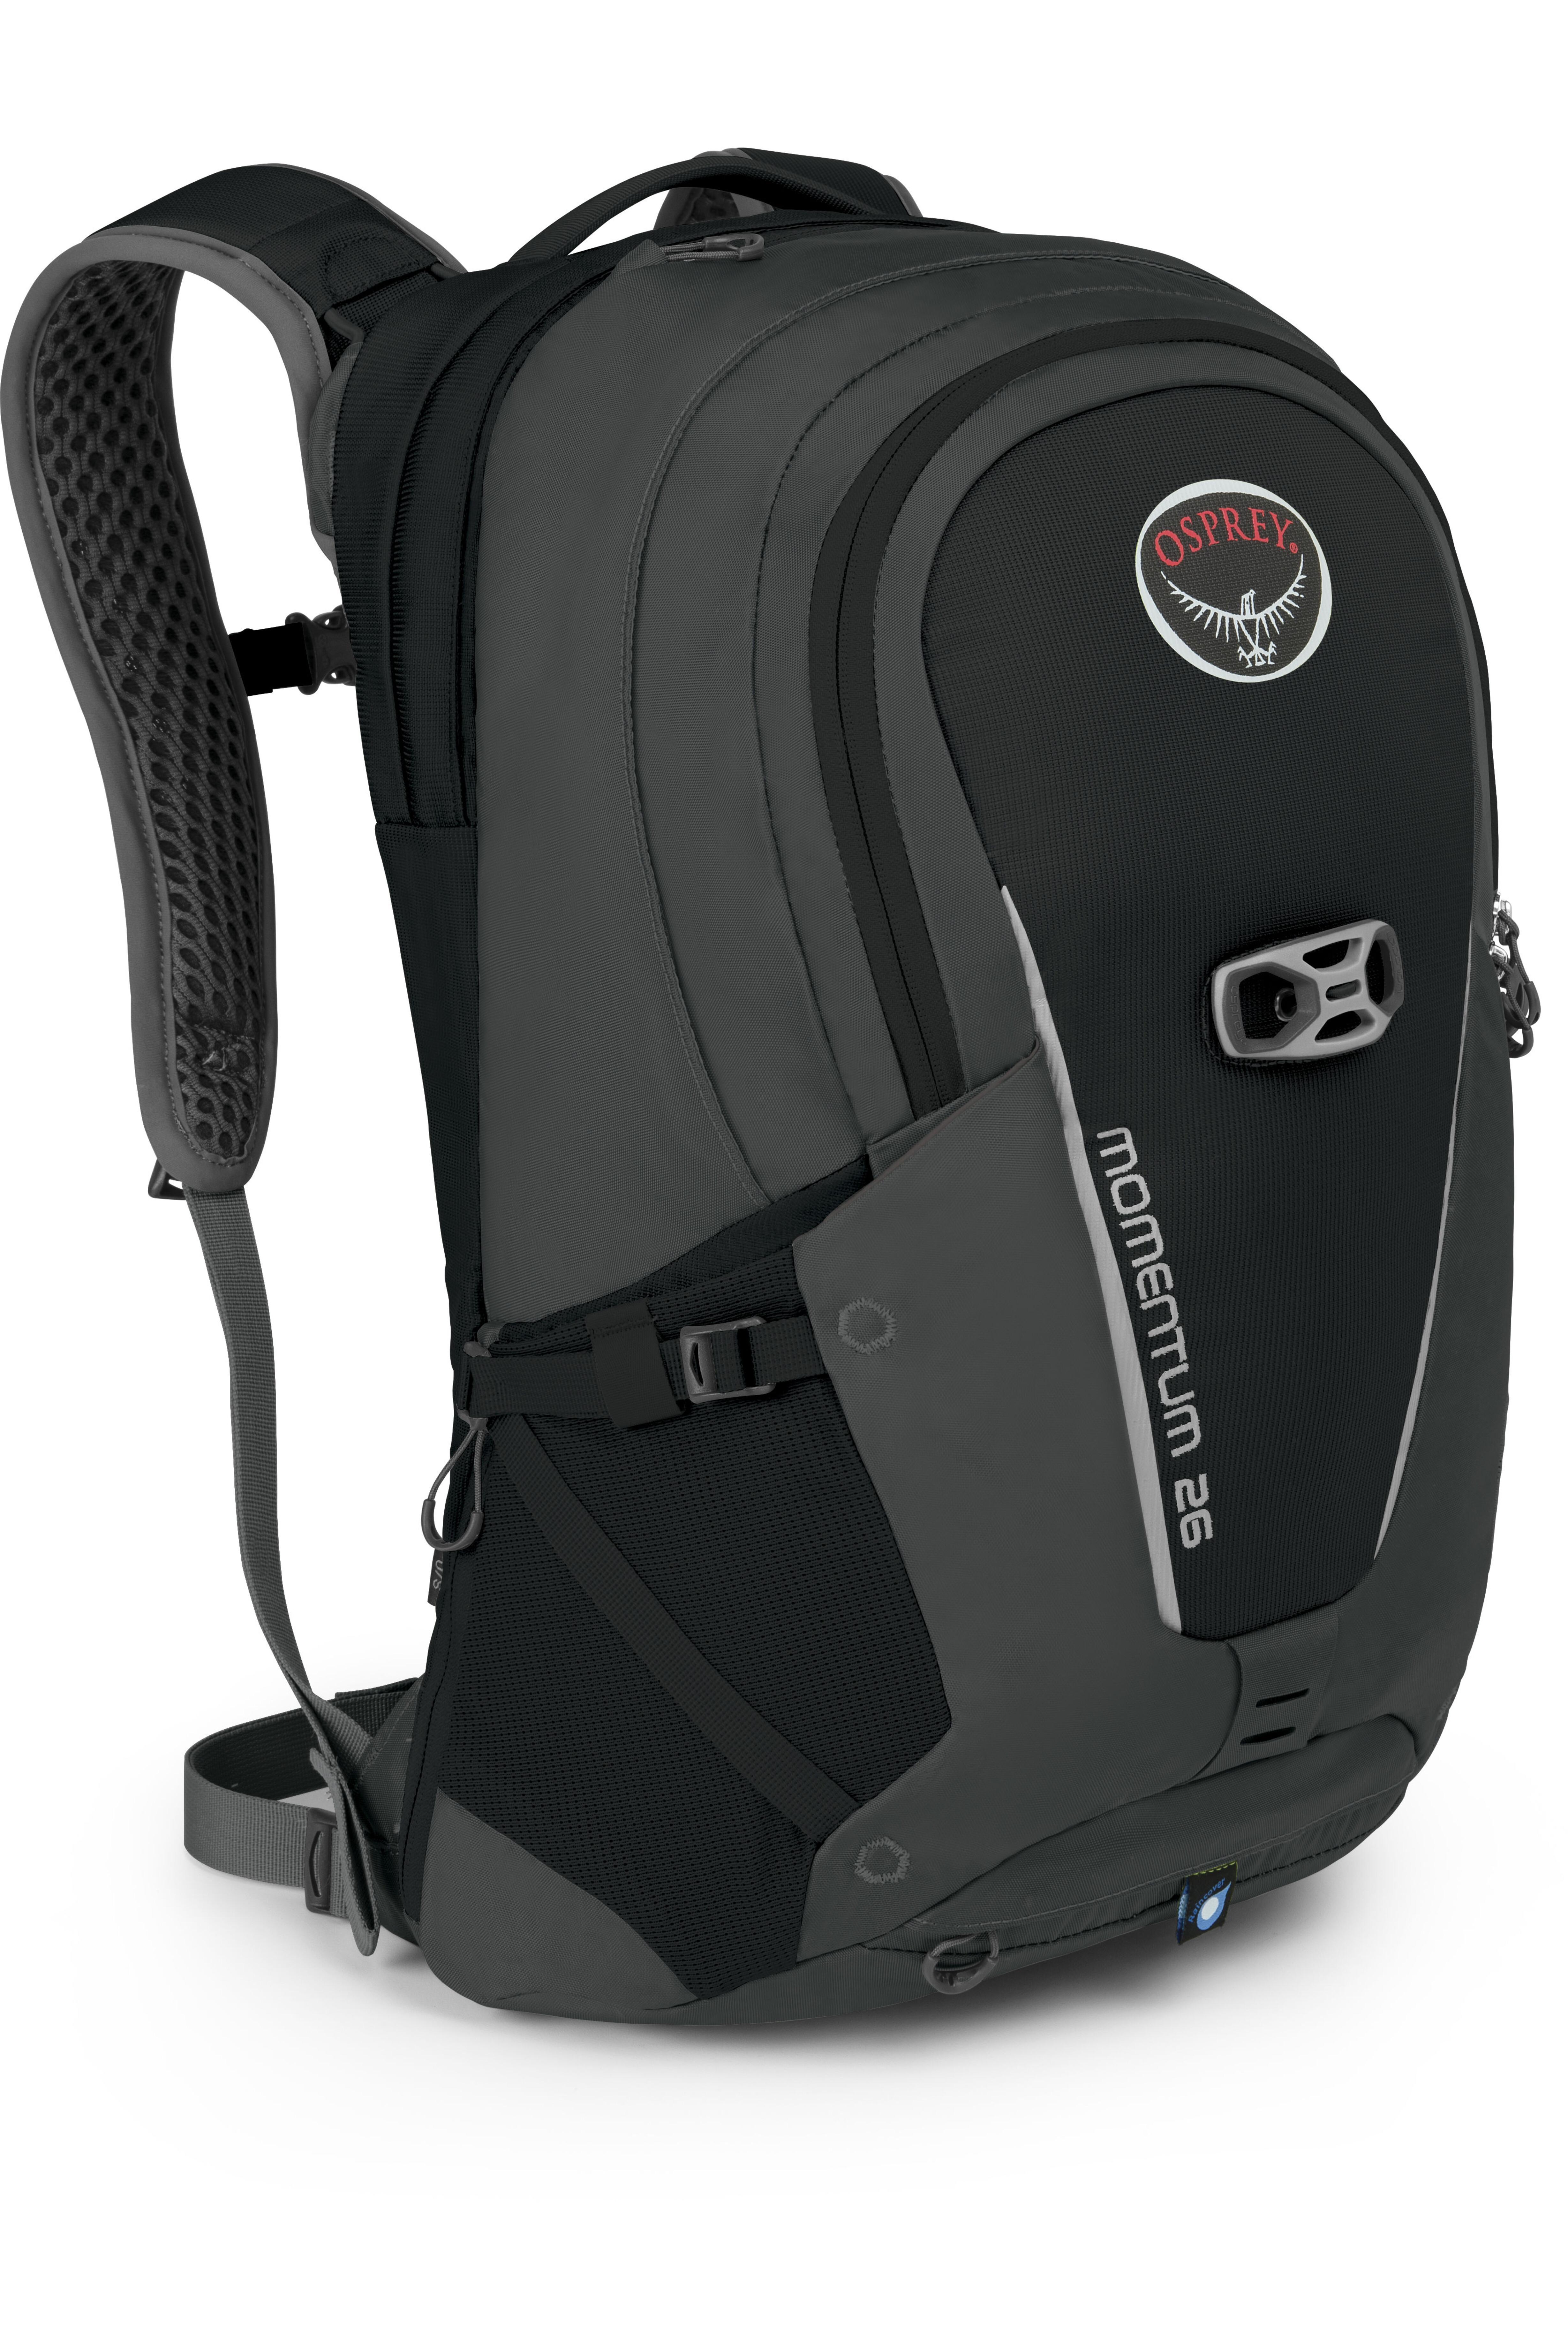 dea046699dce9 Osprey Momentum 26 Plecak czarny